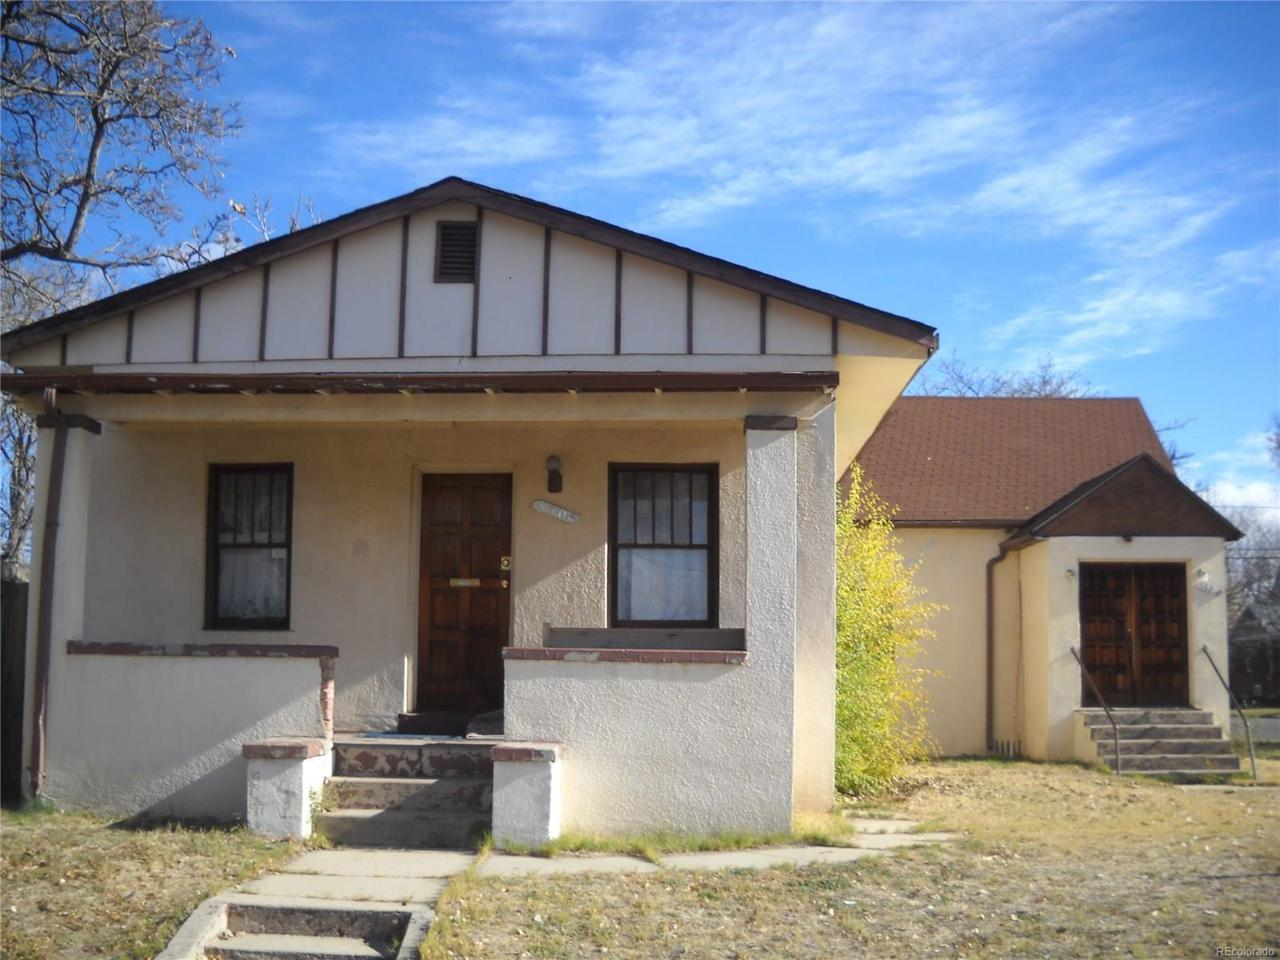 3504 High Street, Denver, CO 80205 (MLS #4554284) :: 8z Real Estate